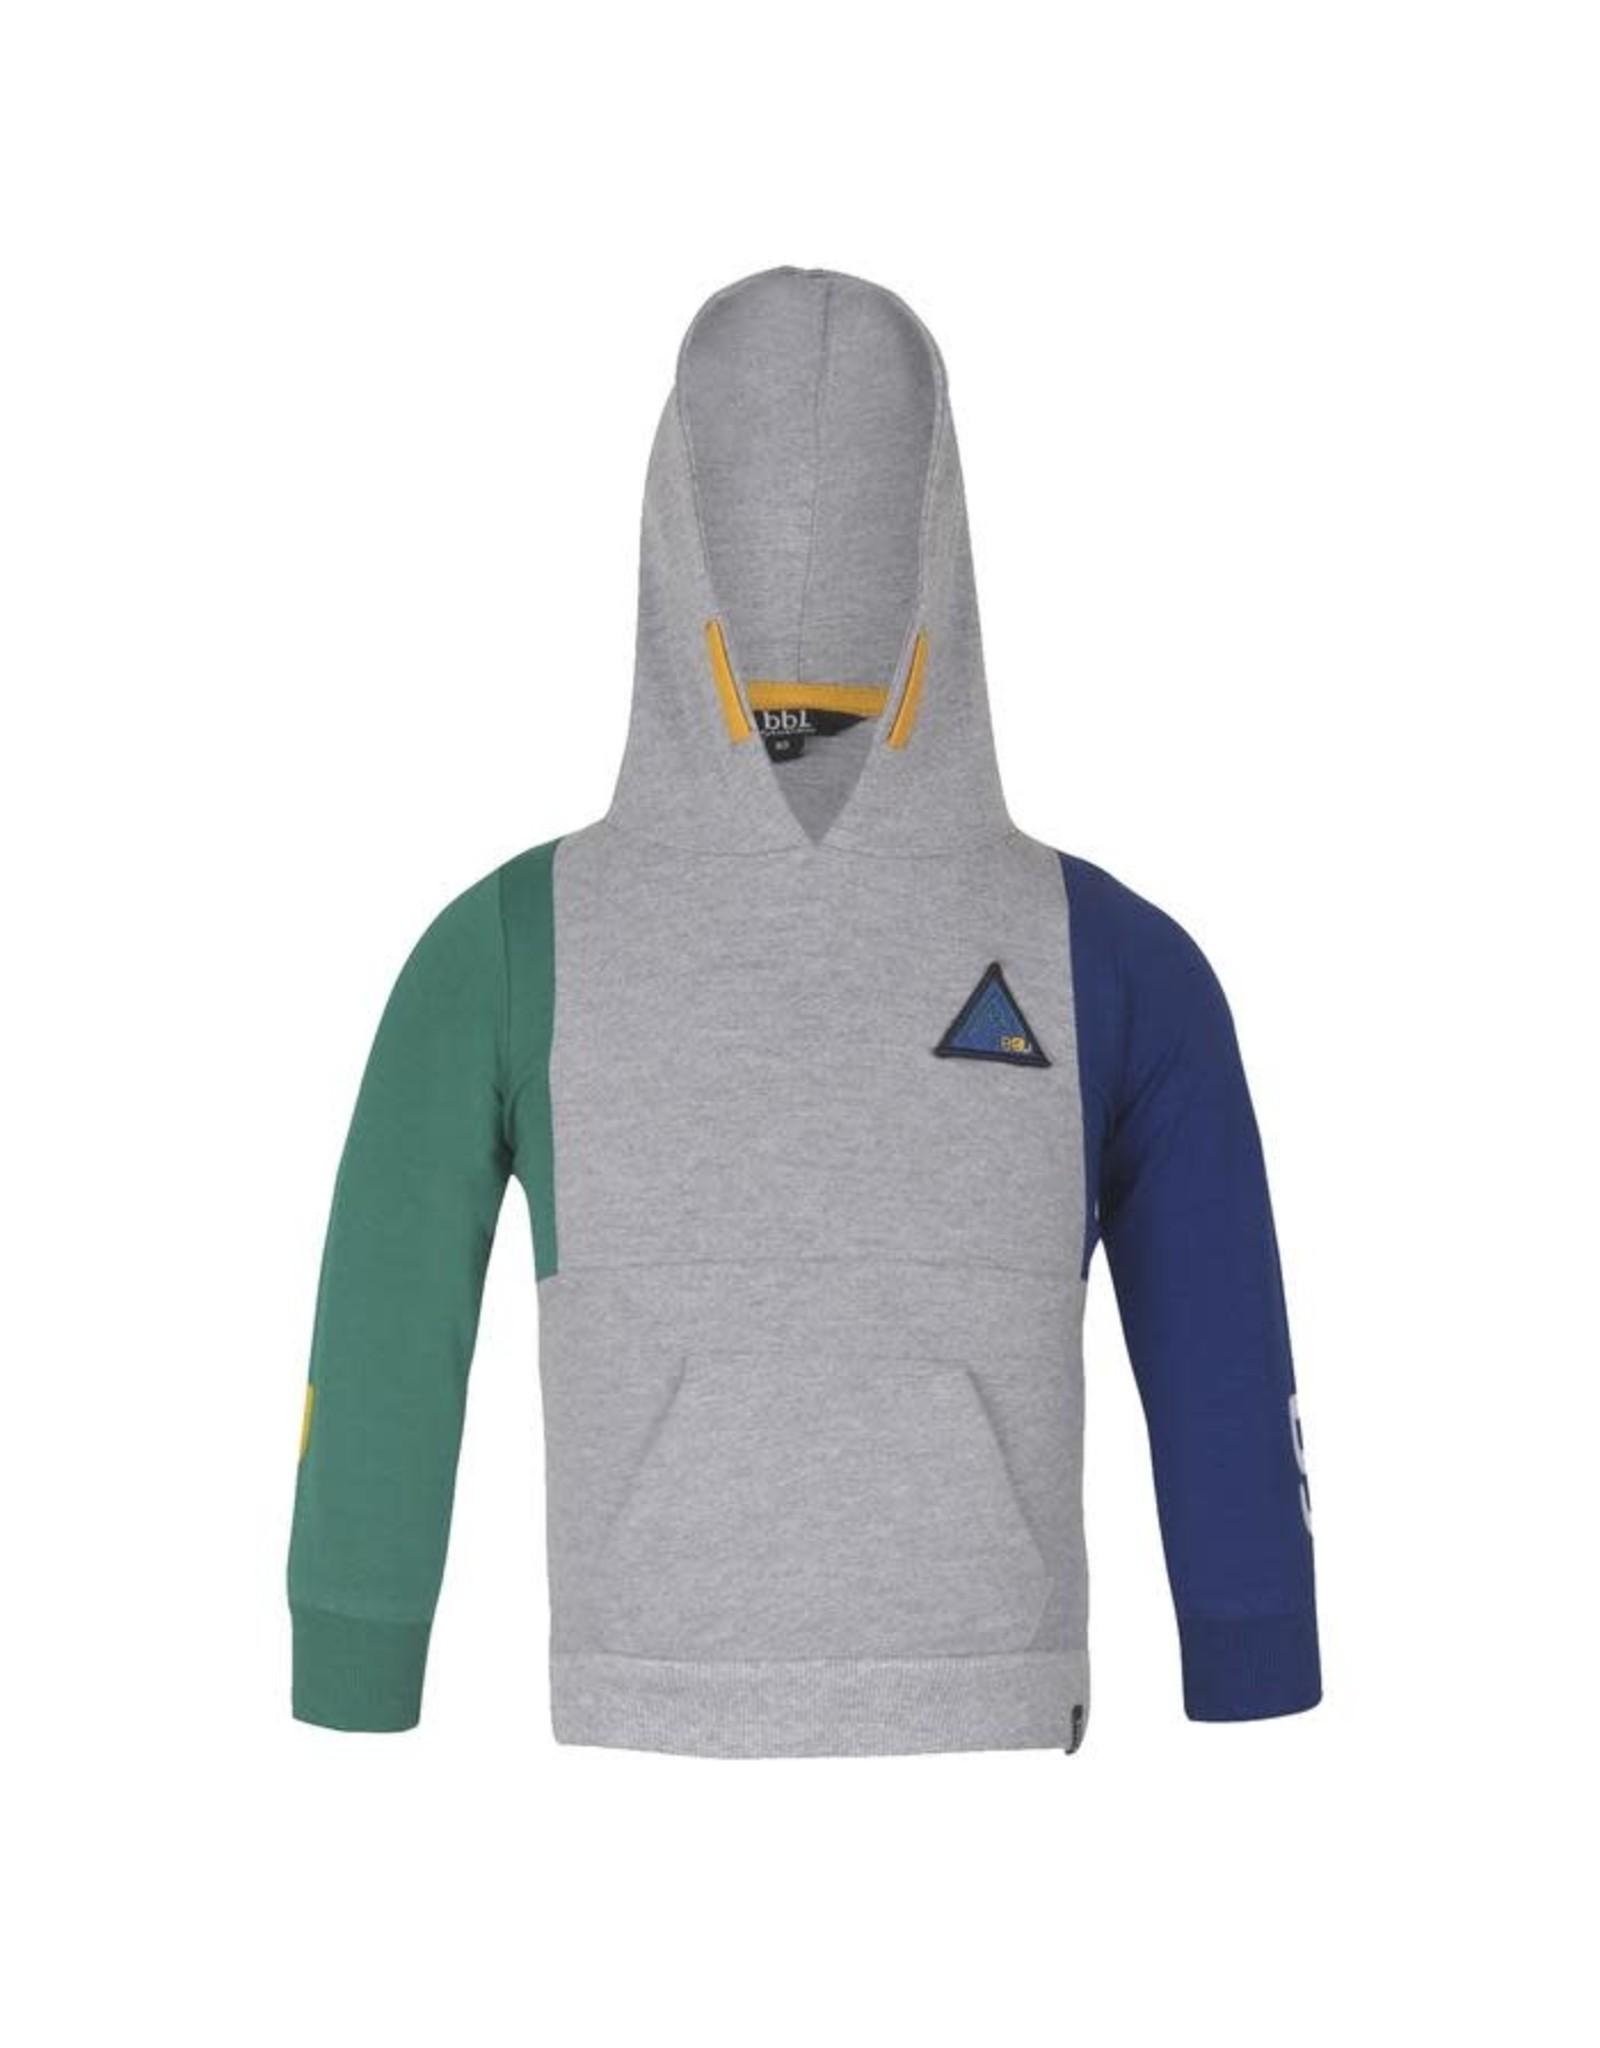 Beebielove 2514 Sweater